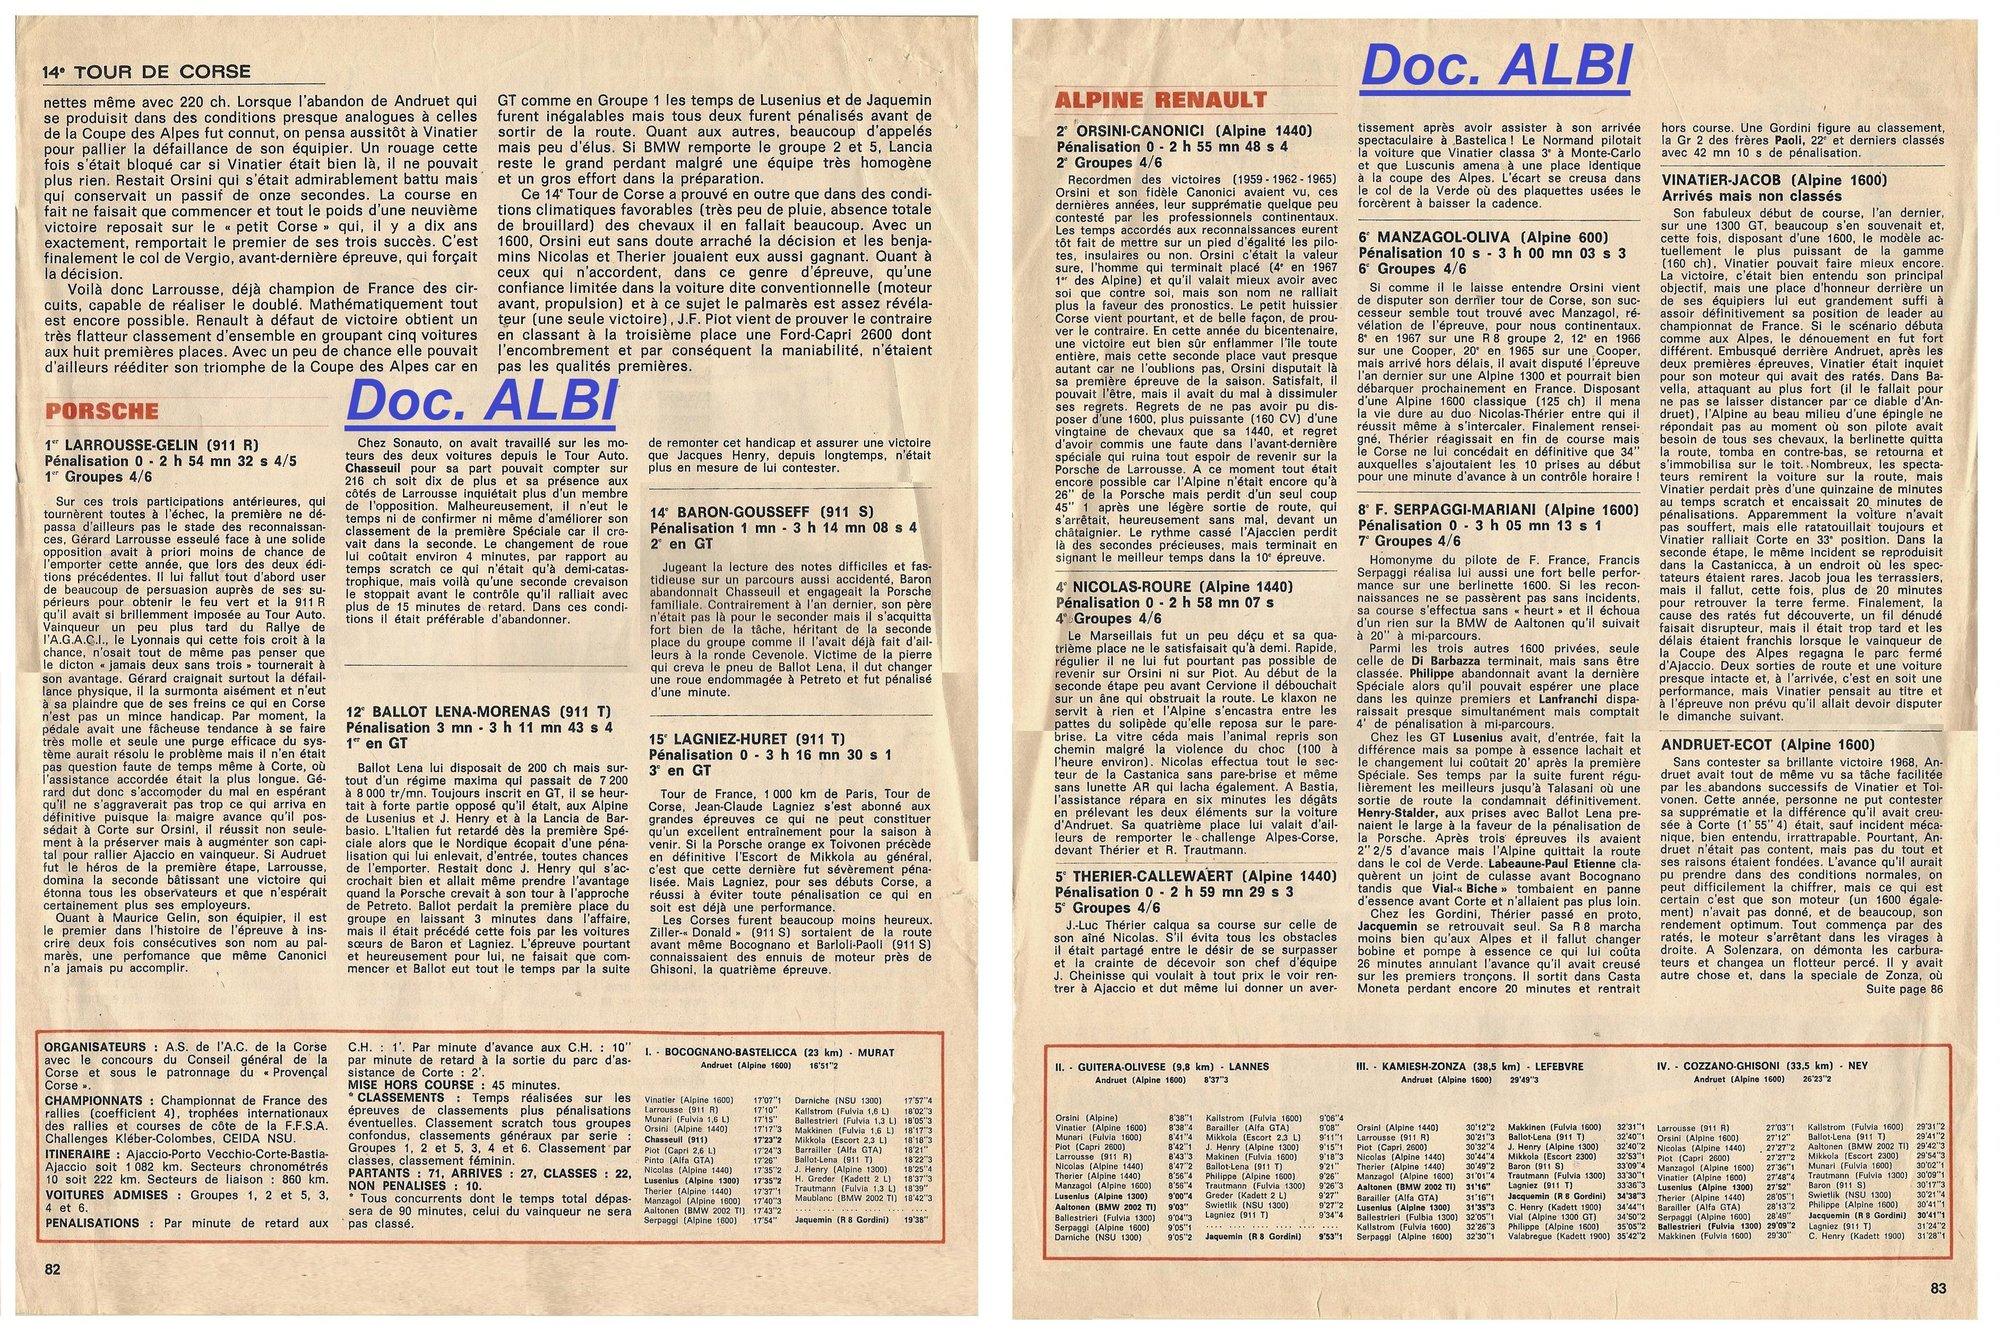 1969-Eu10-Tour-Corse-A-02-03-a.thumb.jpg.d5a826d86872872e2114661c7305bade.jpg